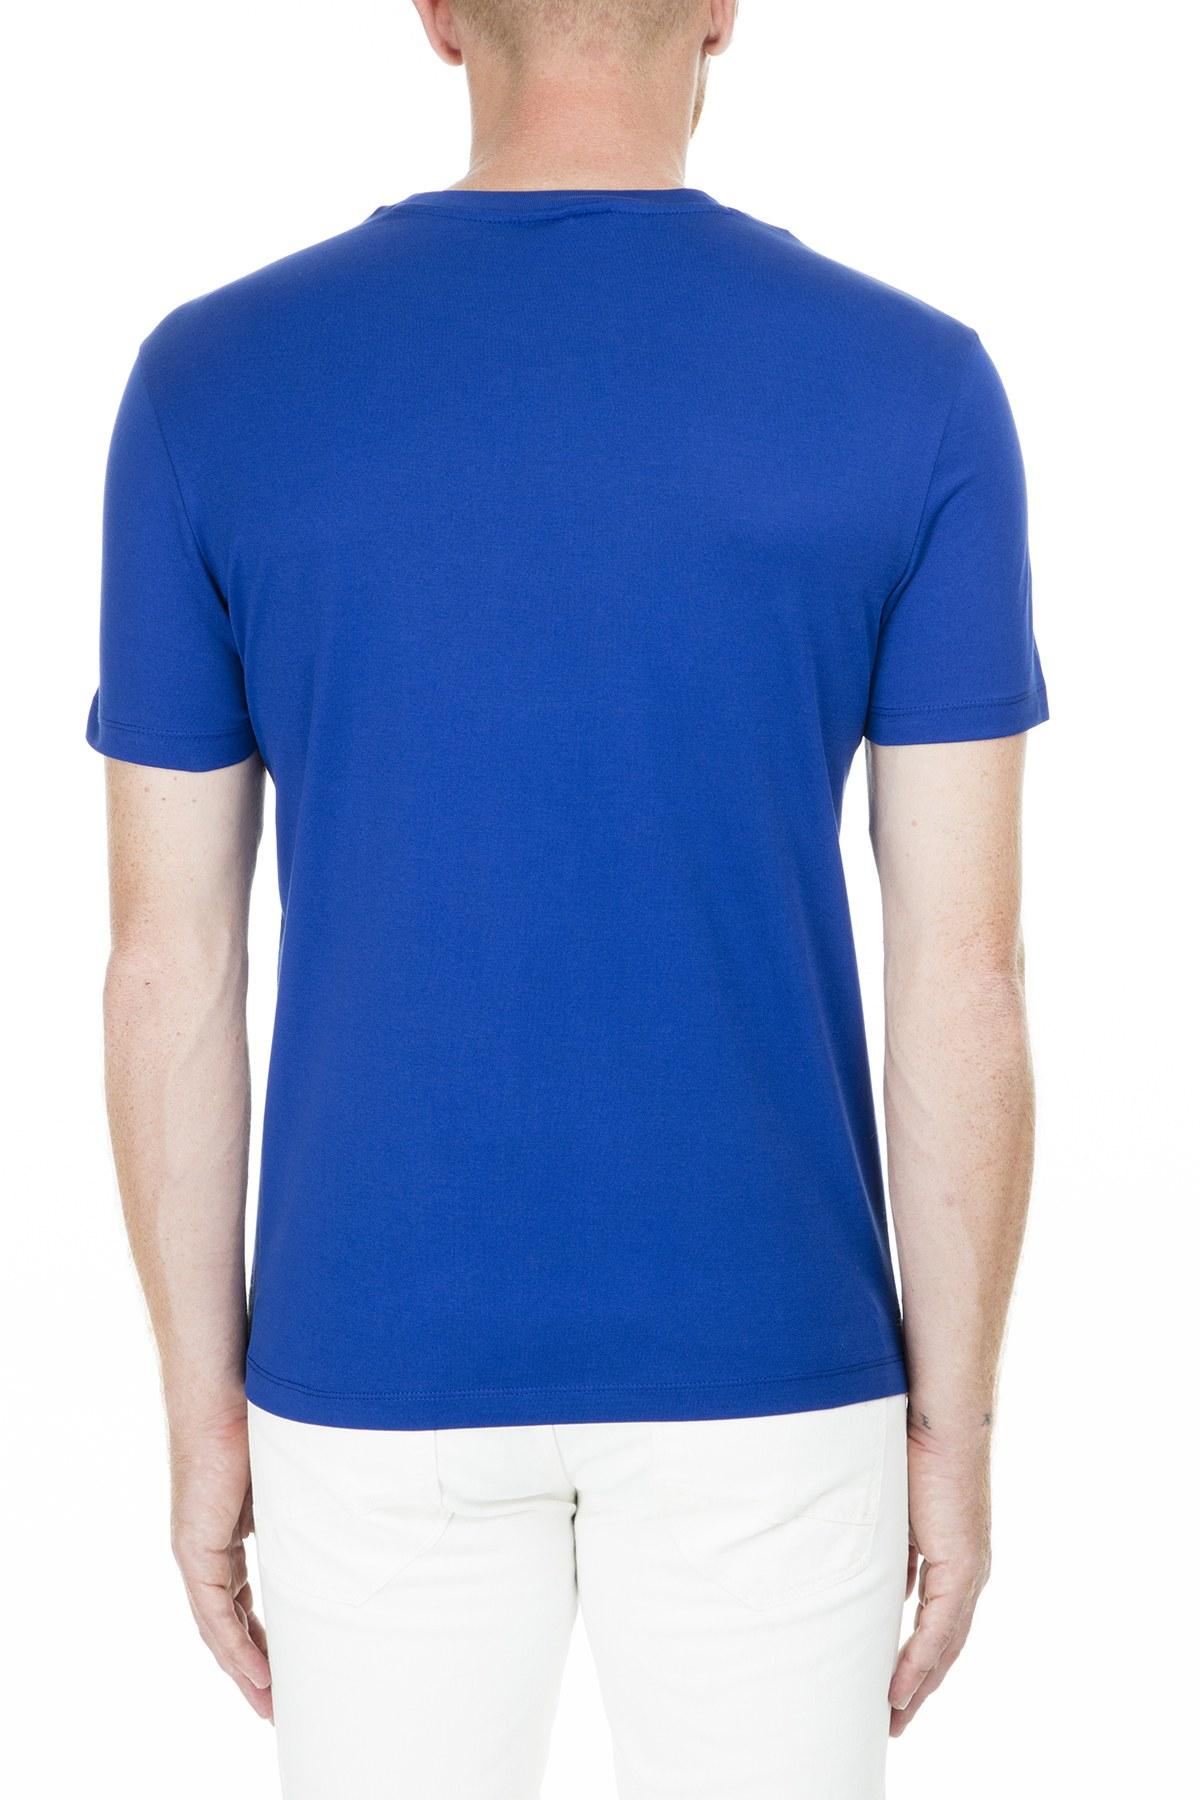 Emporio Armani Erkek T Shirt S 3G1T94 1J30Z 0948 SAKS